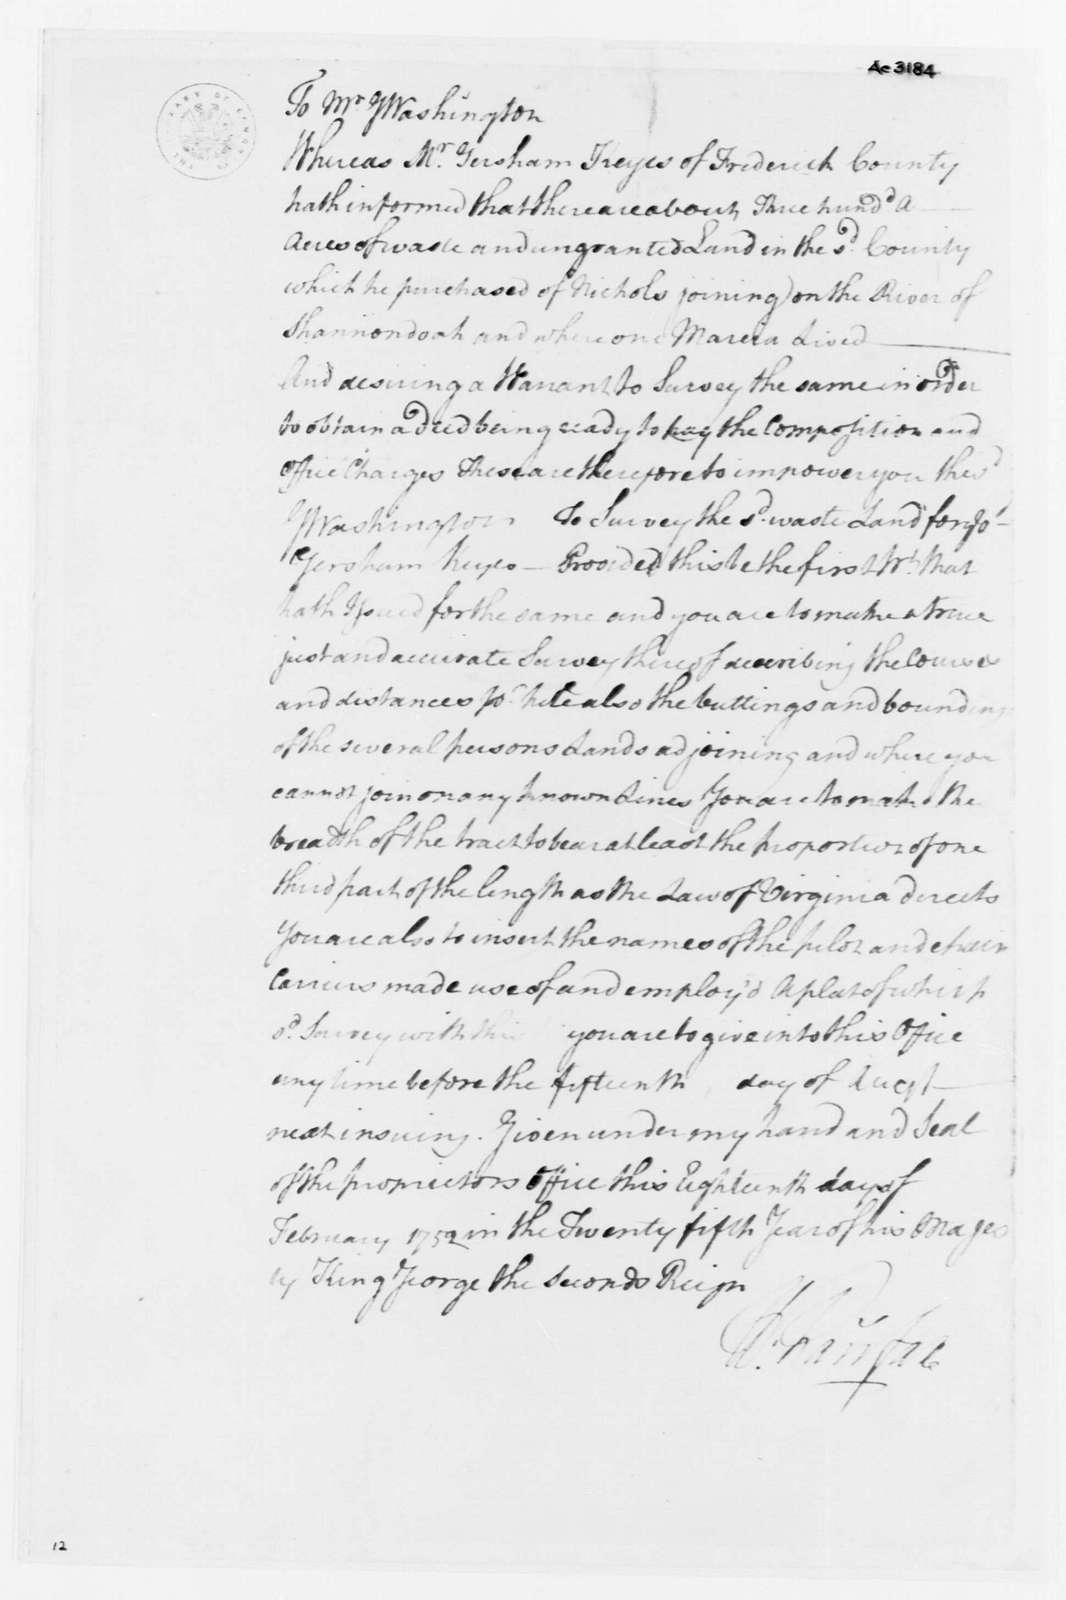 George Washington Papers, Series 4, General Correspondence: William Fairfax to George Washington, February 18, 1752, Survey Order